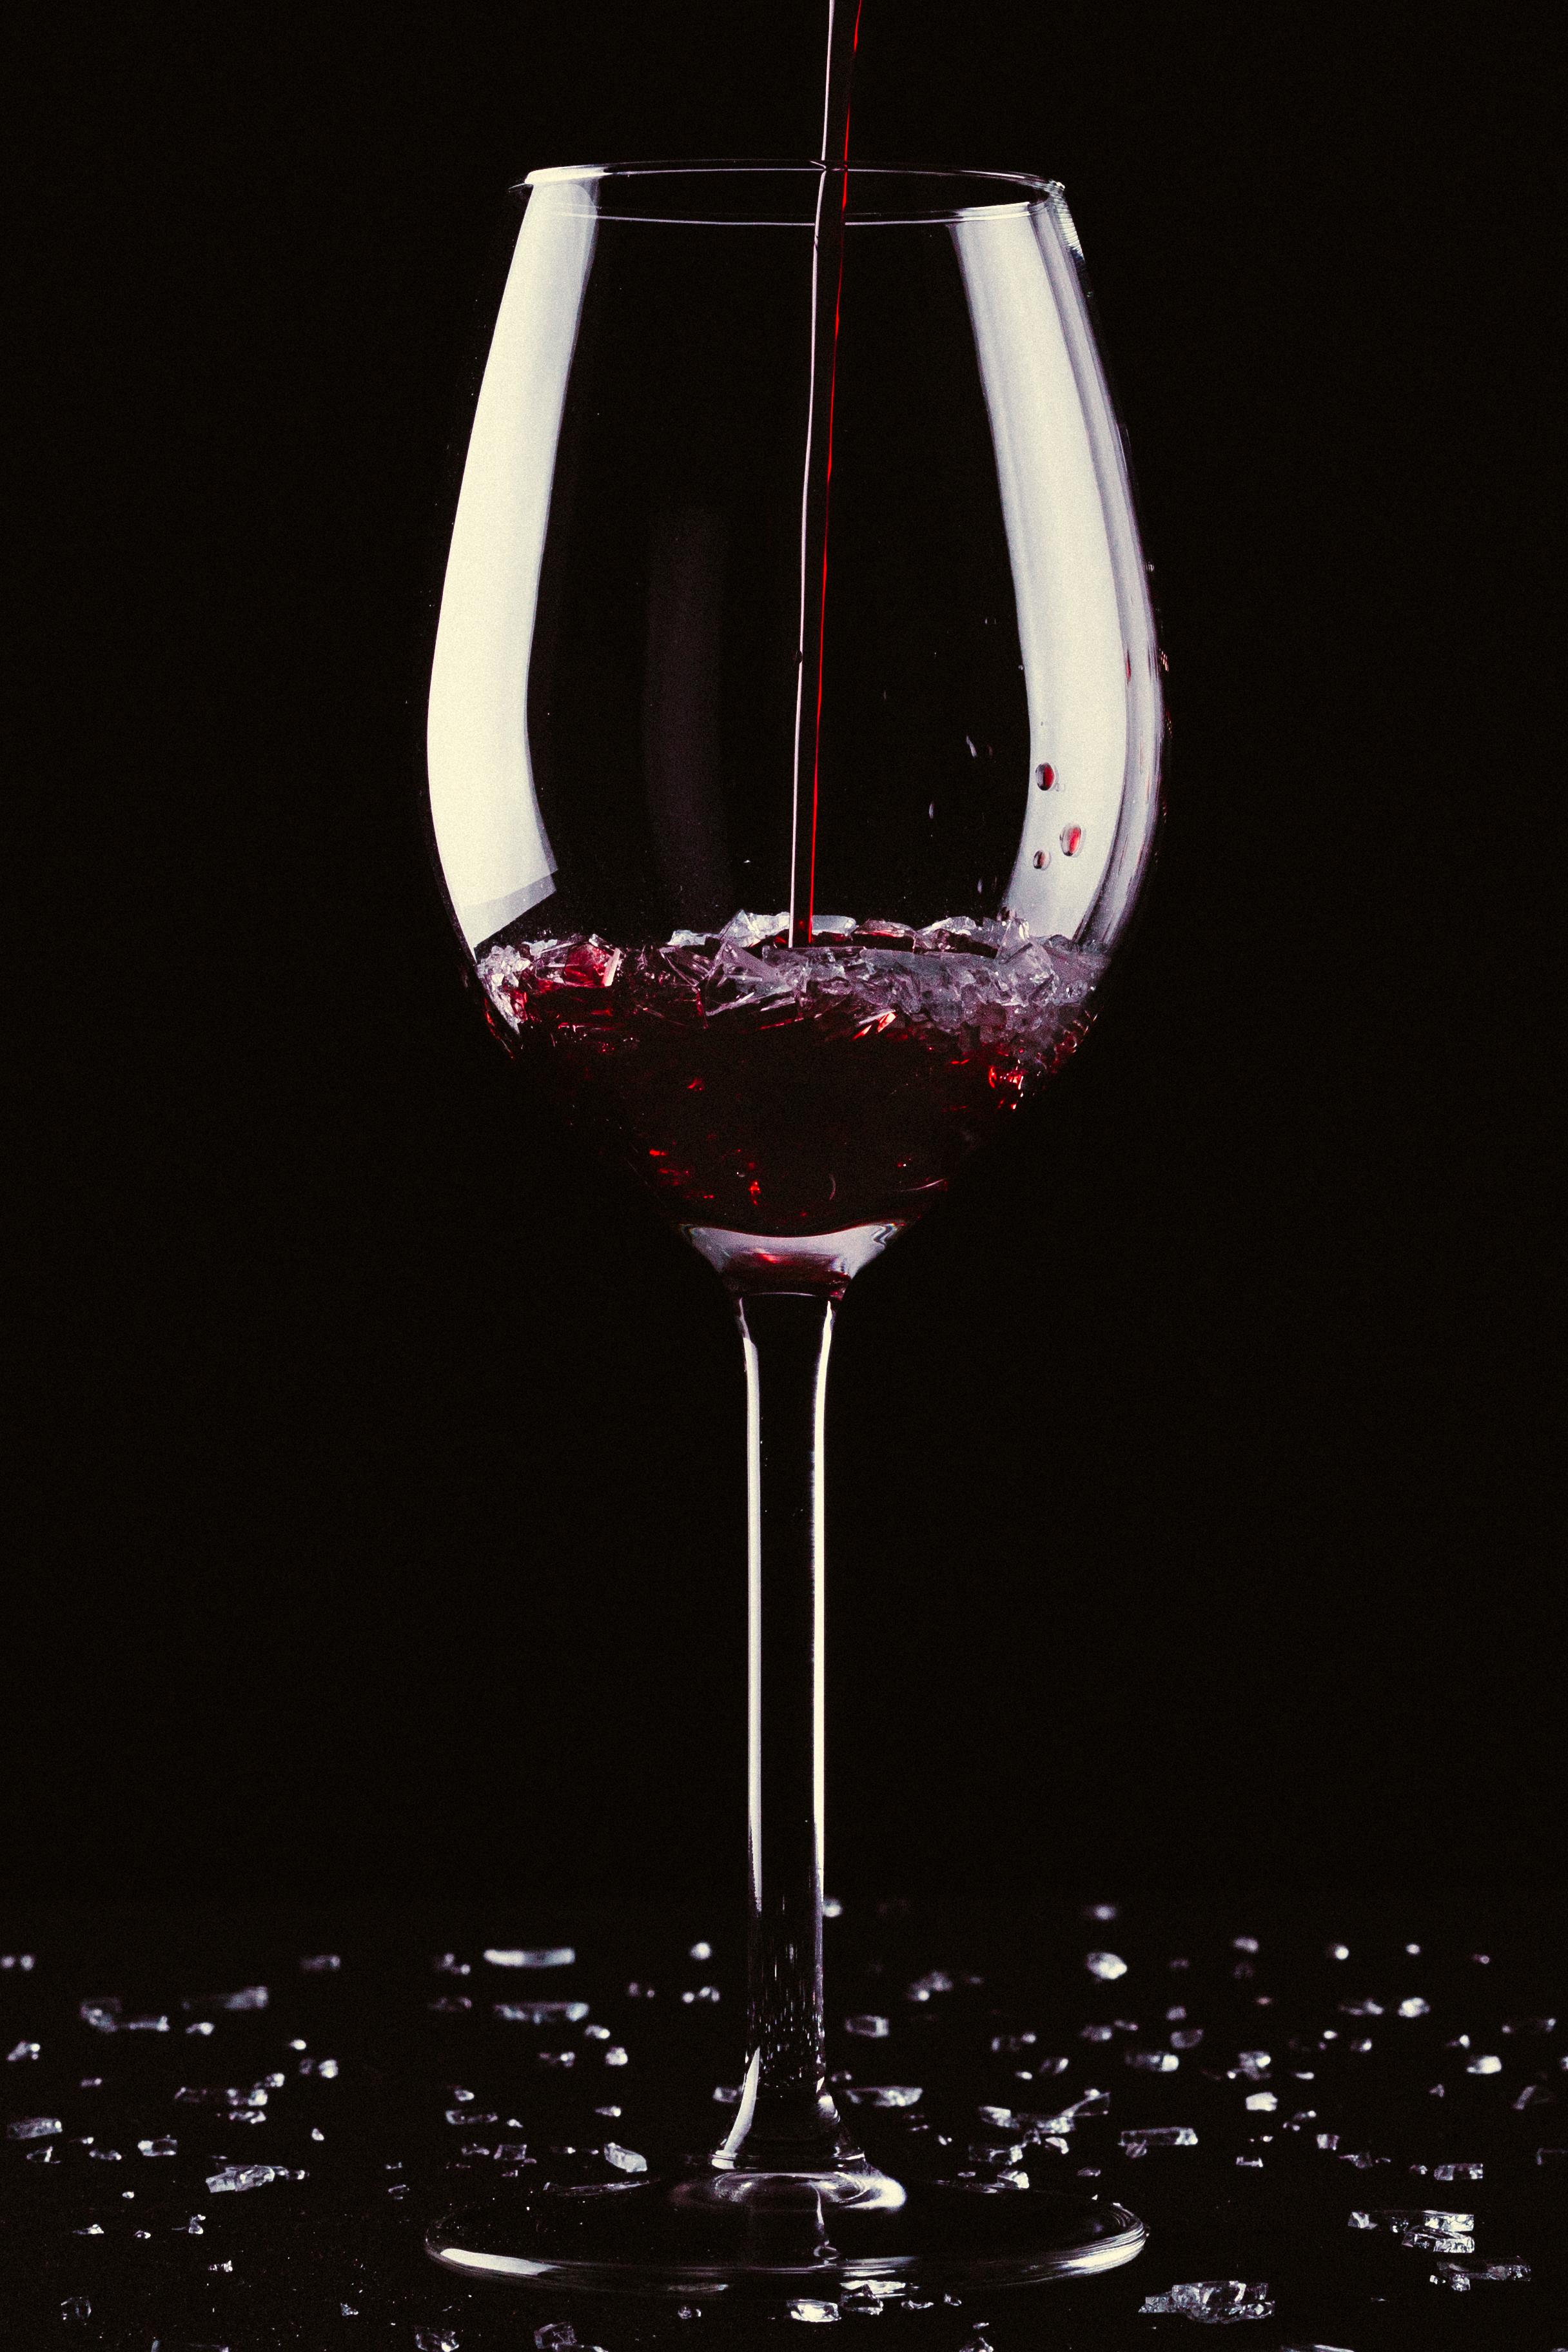 Free stock photo of toast, dark, alcohol, bar